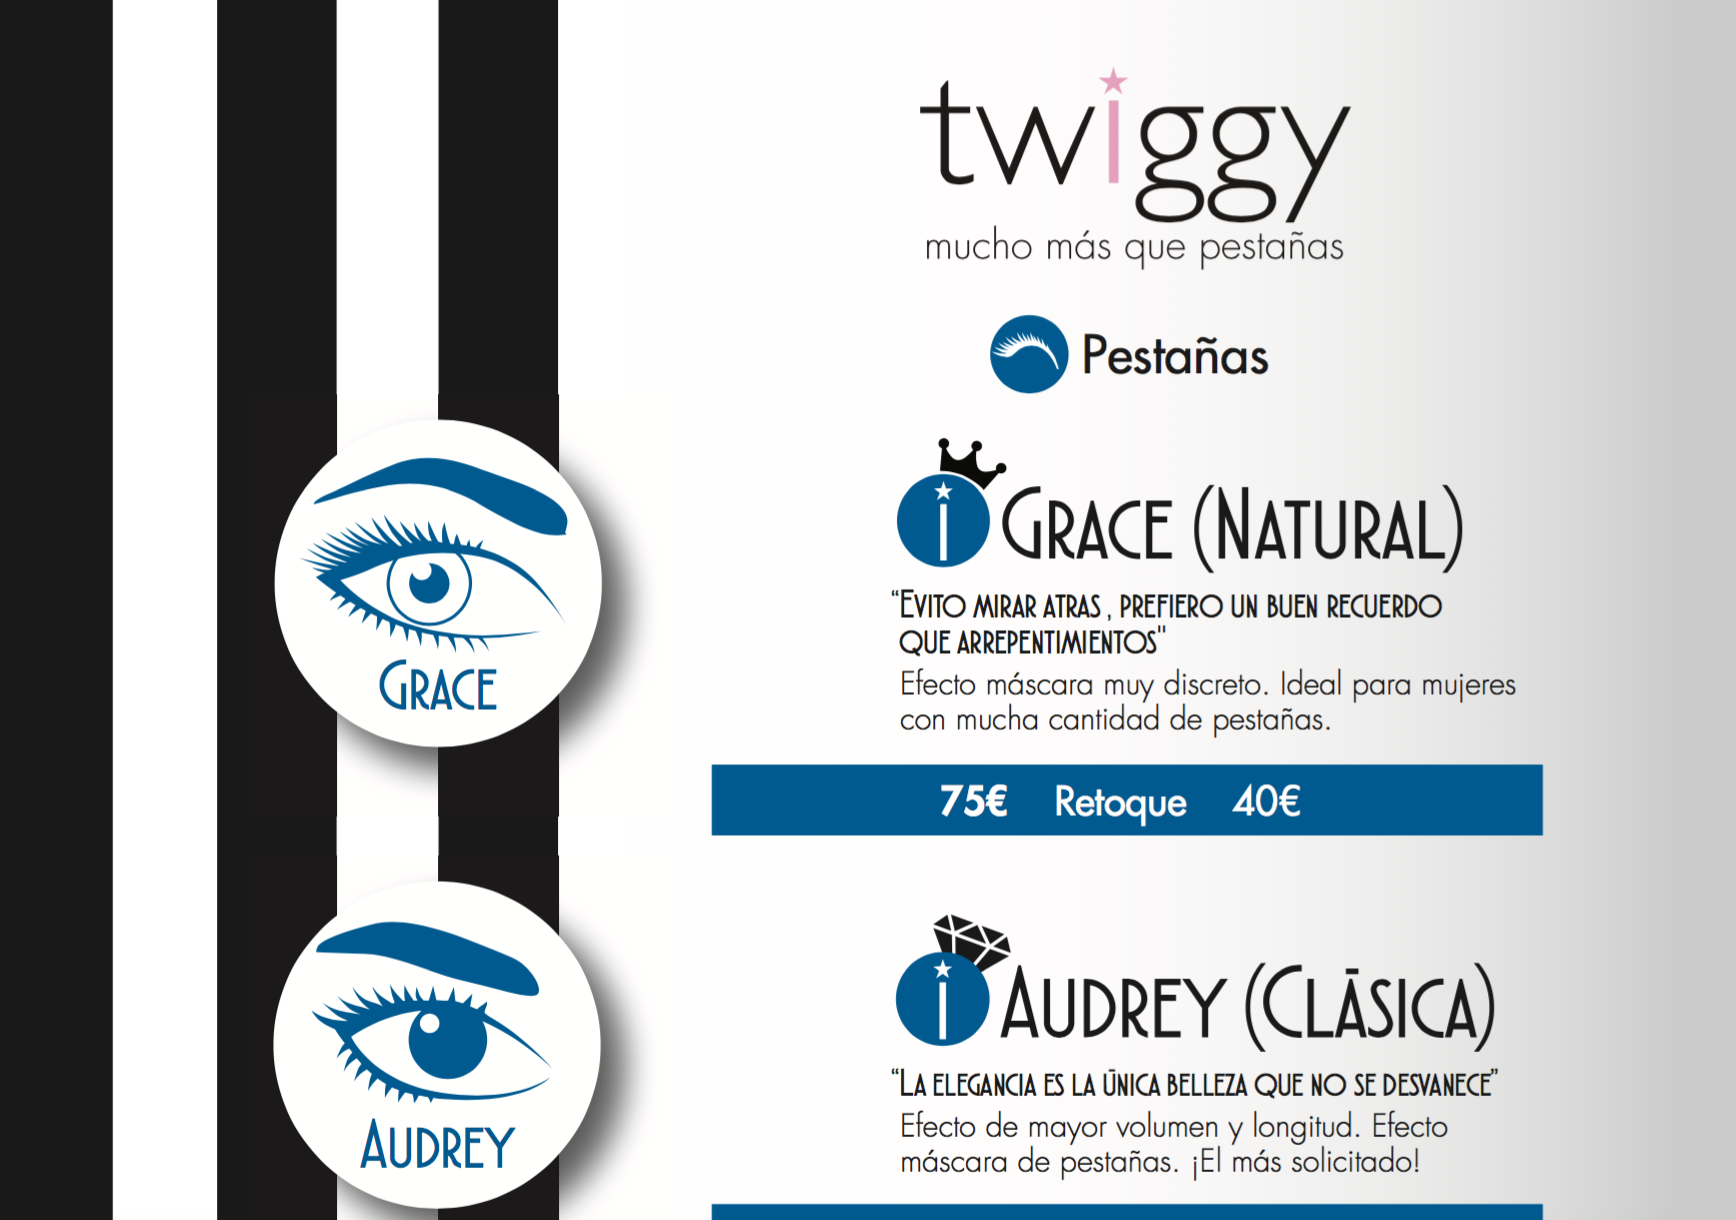 twiggy-blog-de-moda-extension-de-pestañas-Madrid-eyelashes-extension-ChicAdicta-PiensaenChic-Piensa-en-Chic